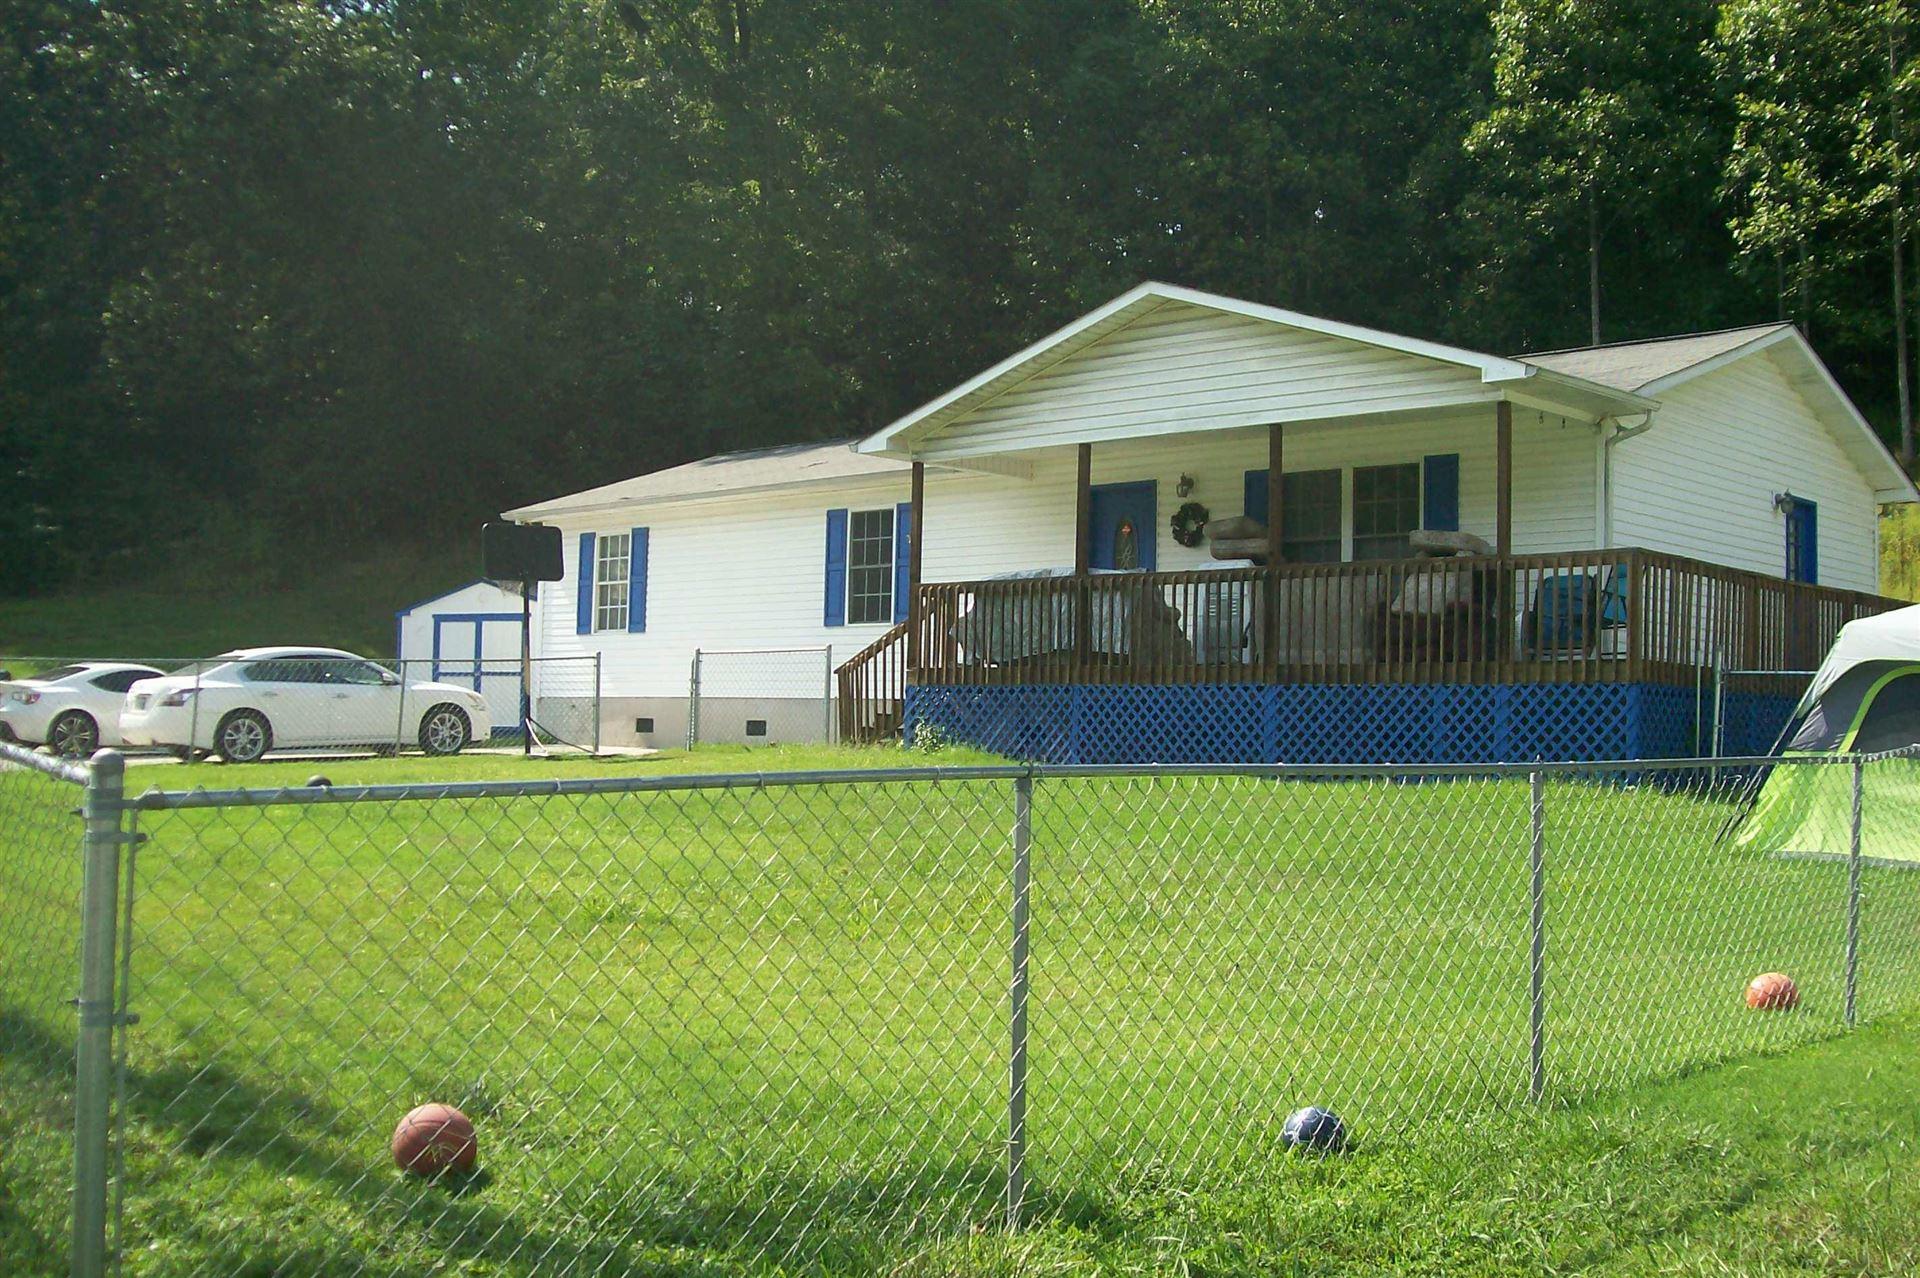 Photo of 990 Lake City Hwy, Clinton, TN 37716 (MLS # 1164271)